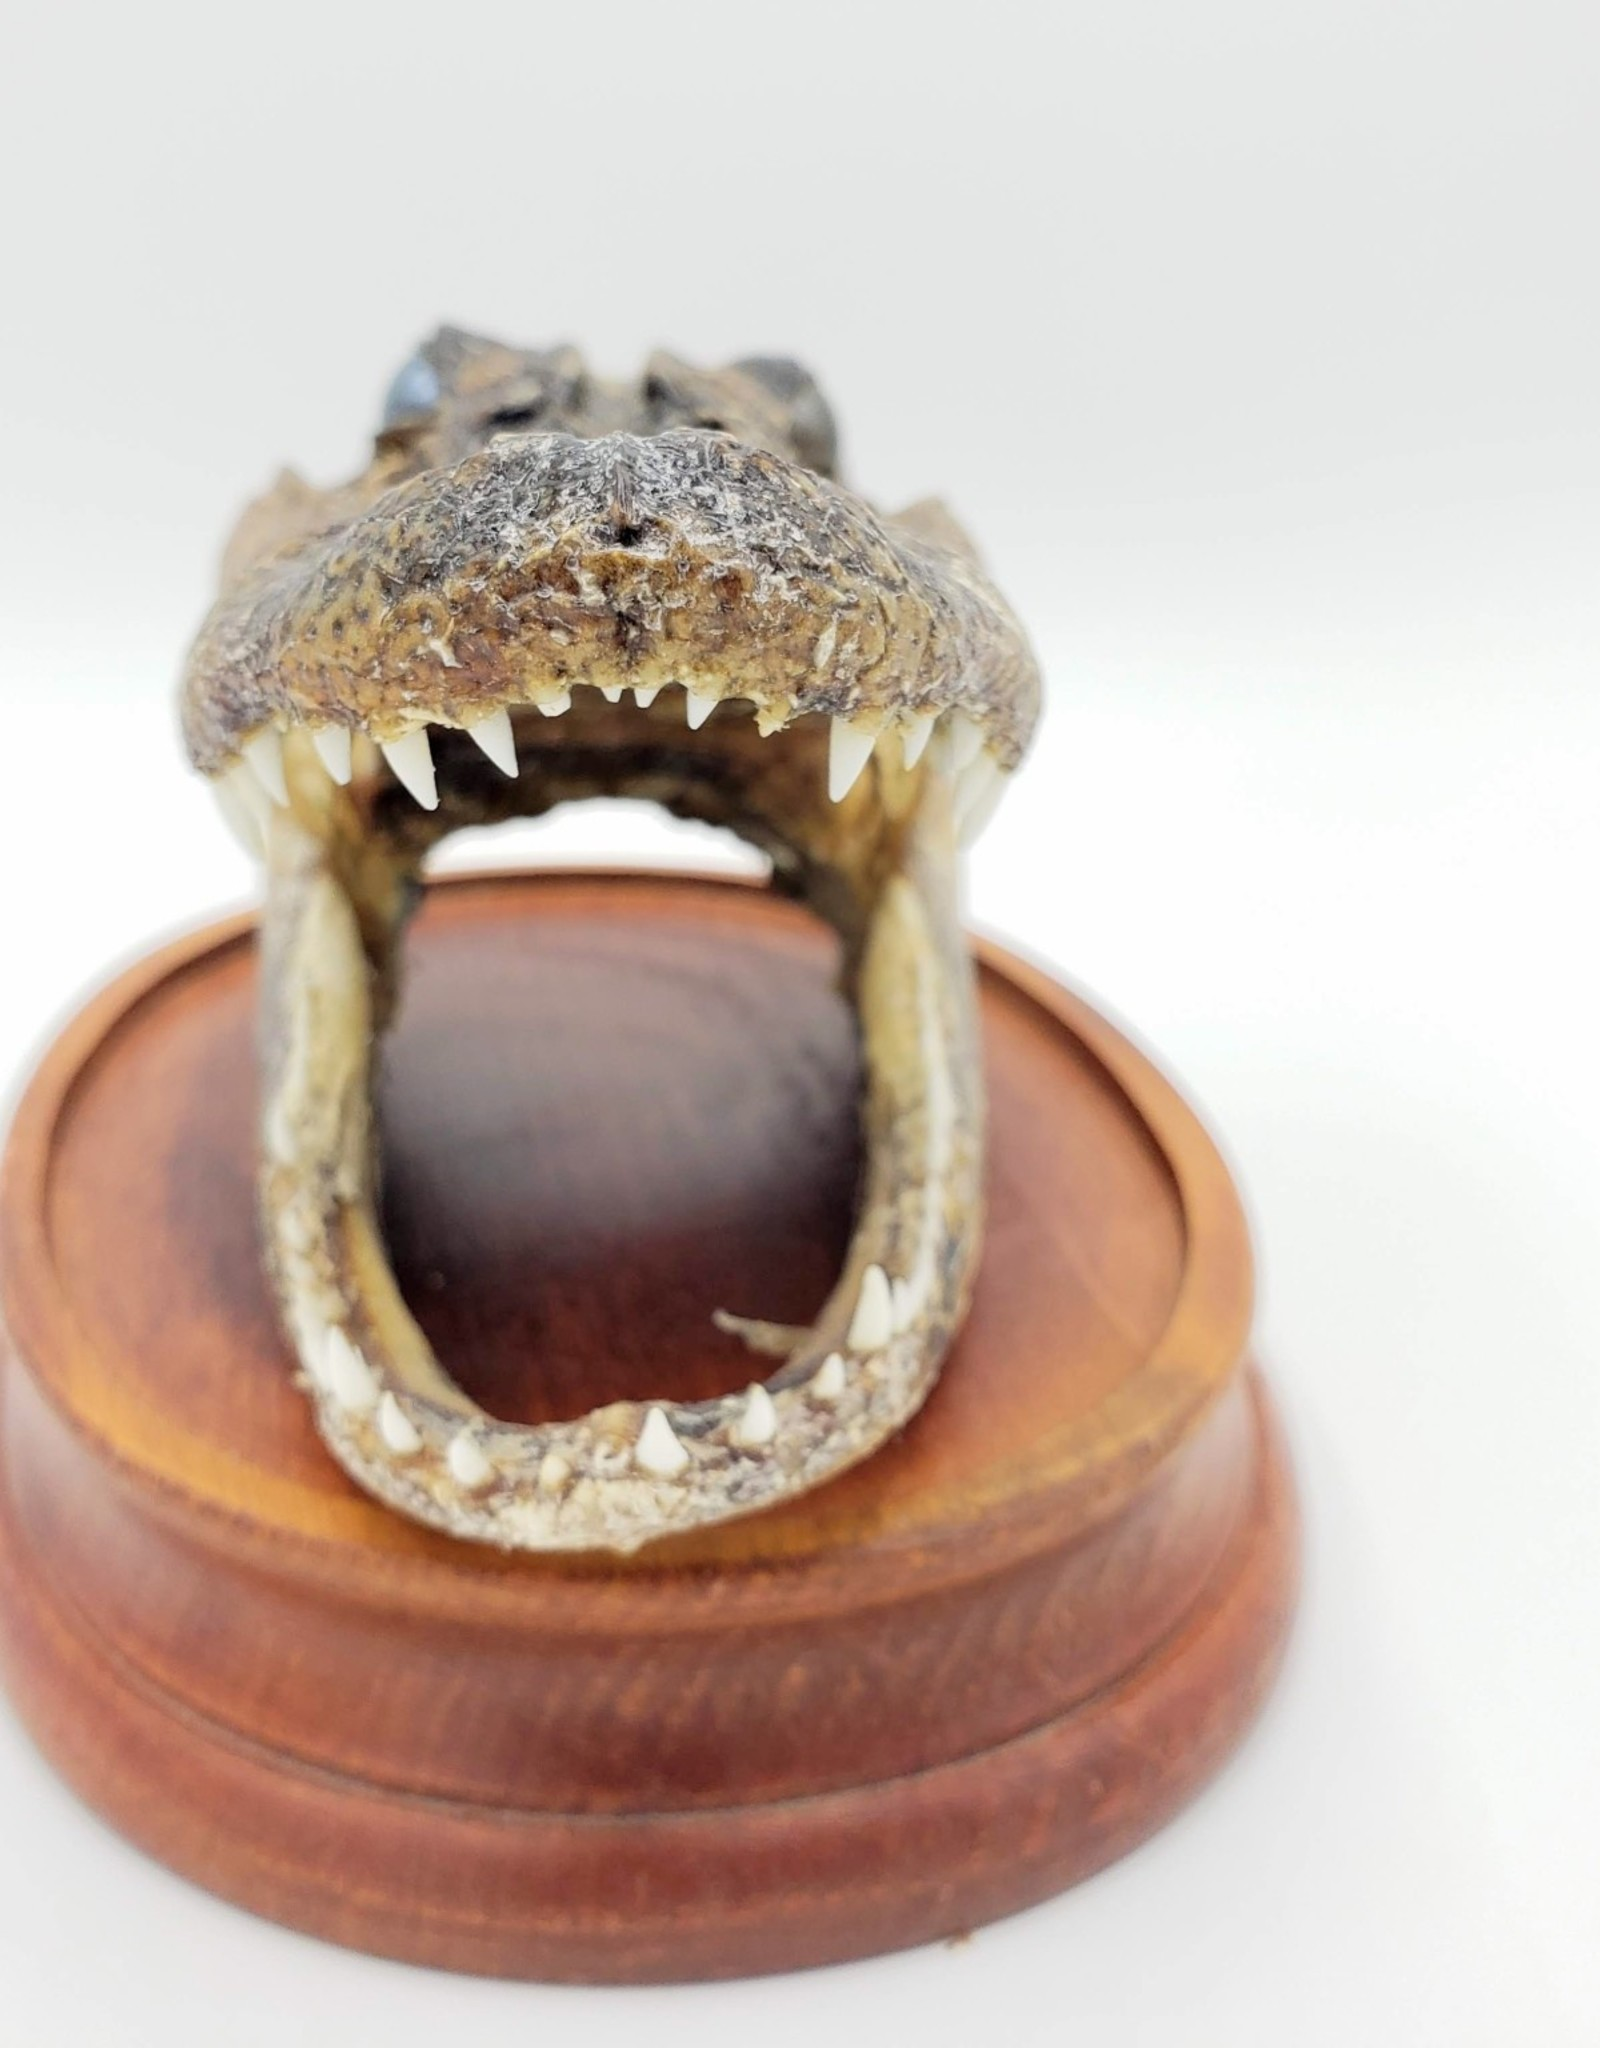 Alligator Head - Taxidermy Preservation